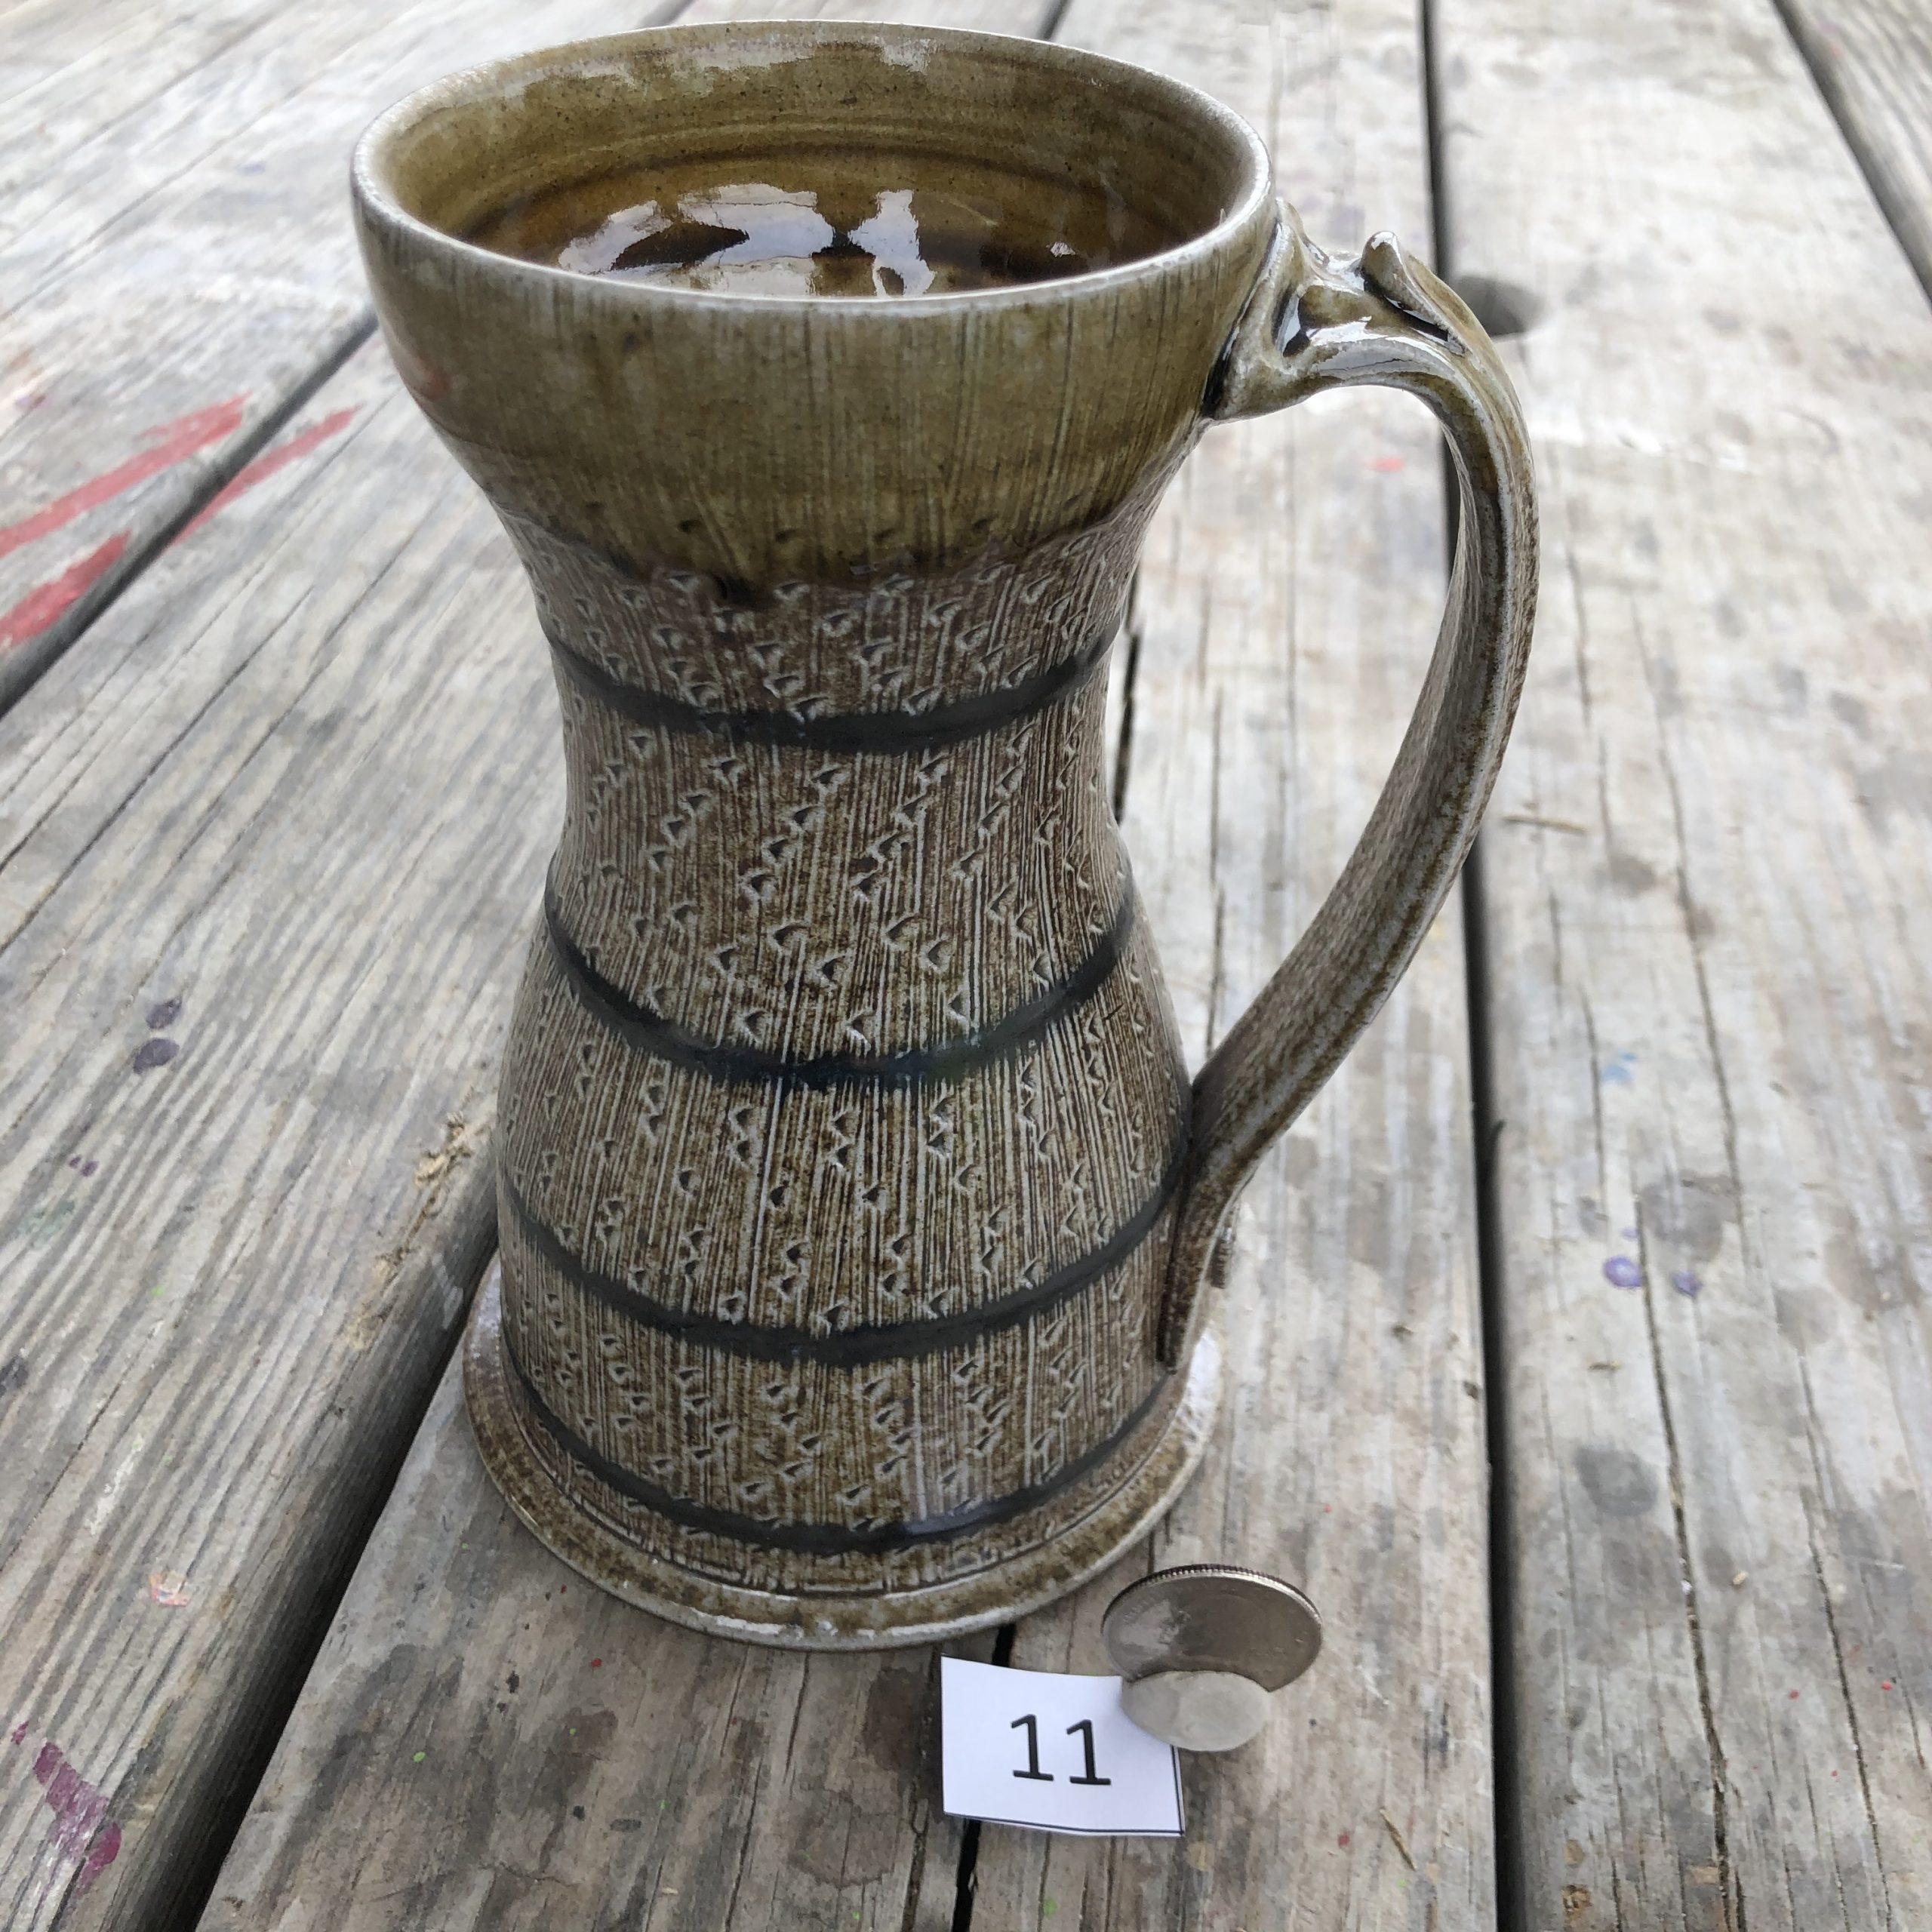 Dan Finnegan Chatter/stripe Mug #11